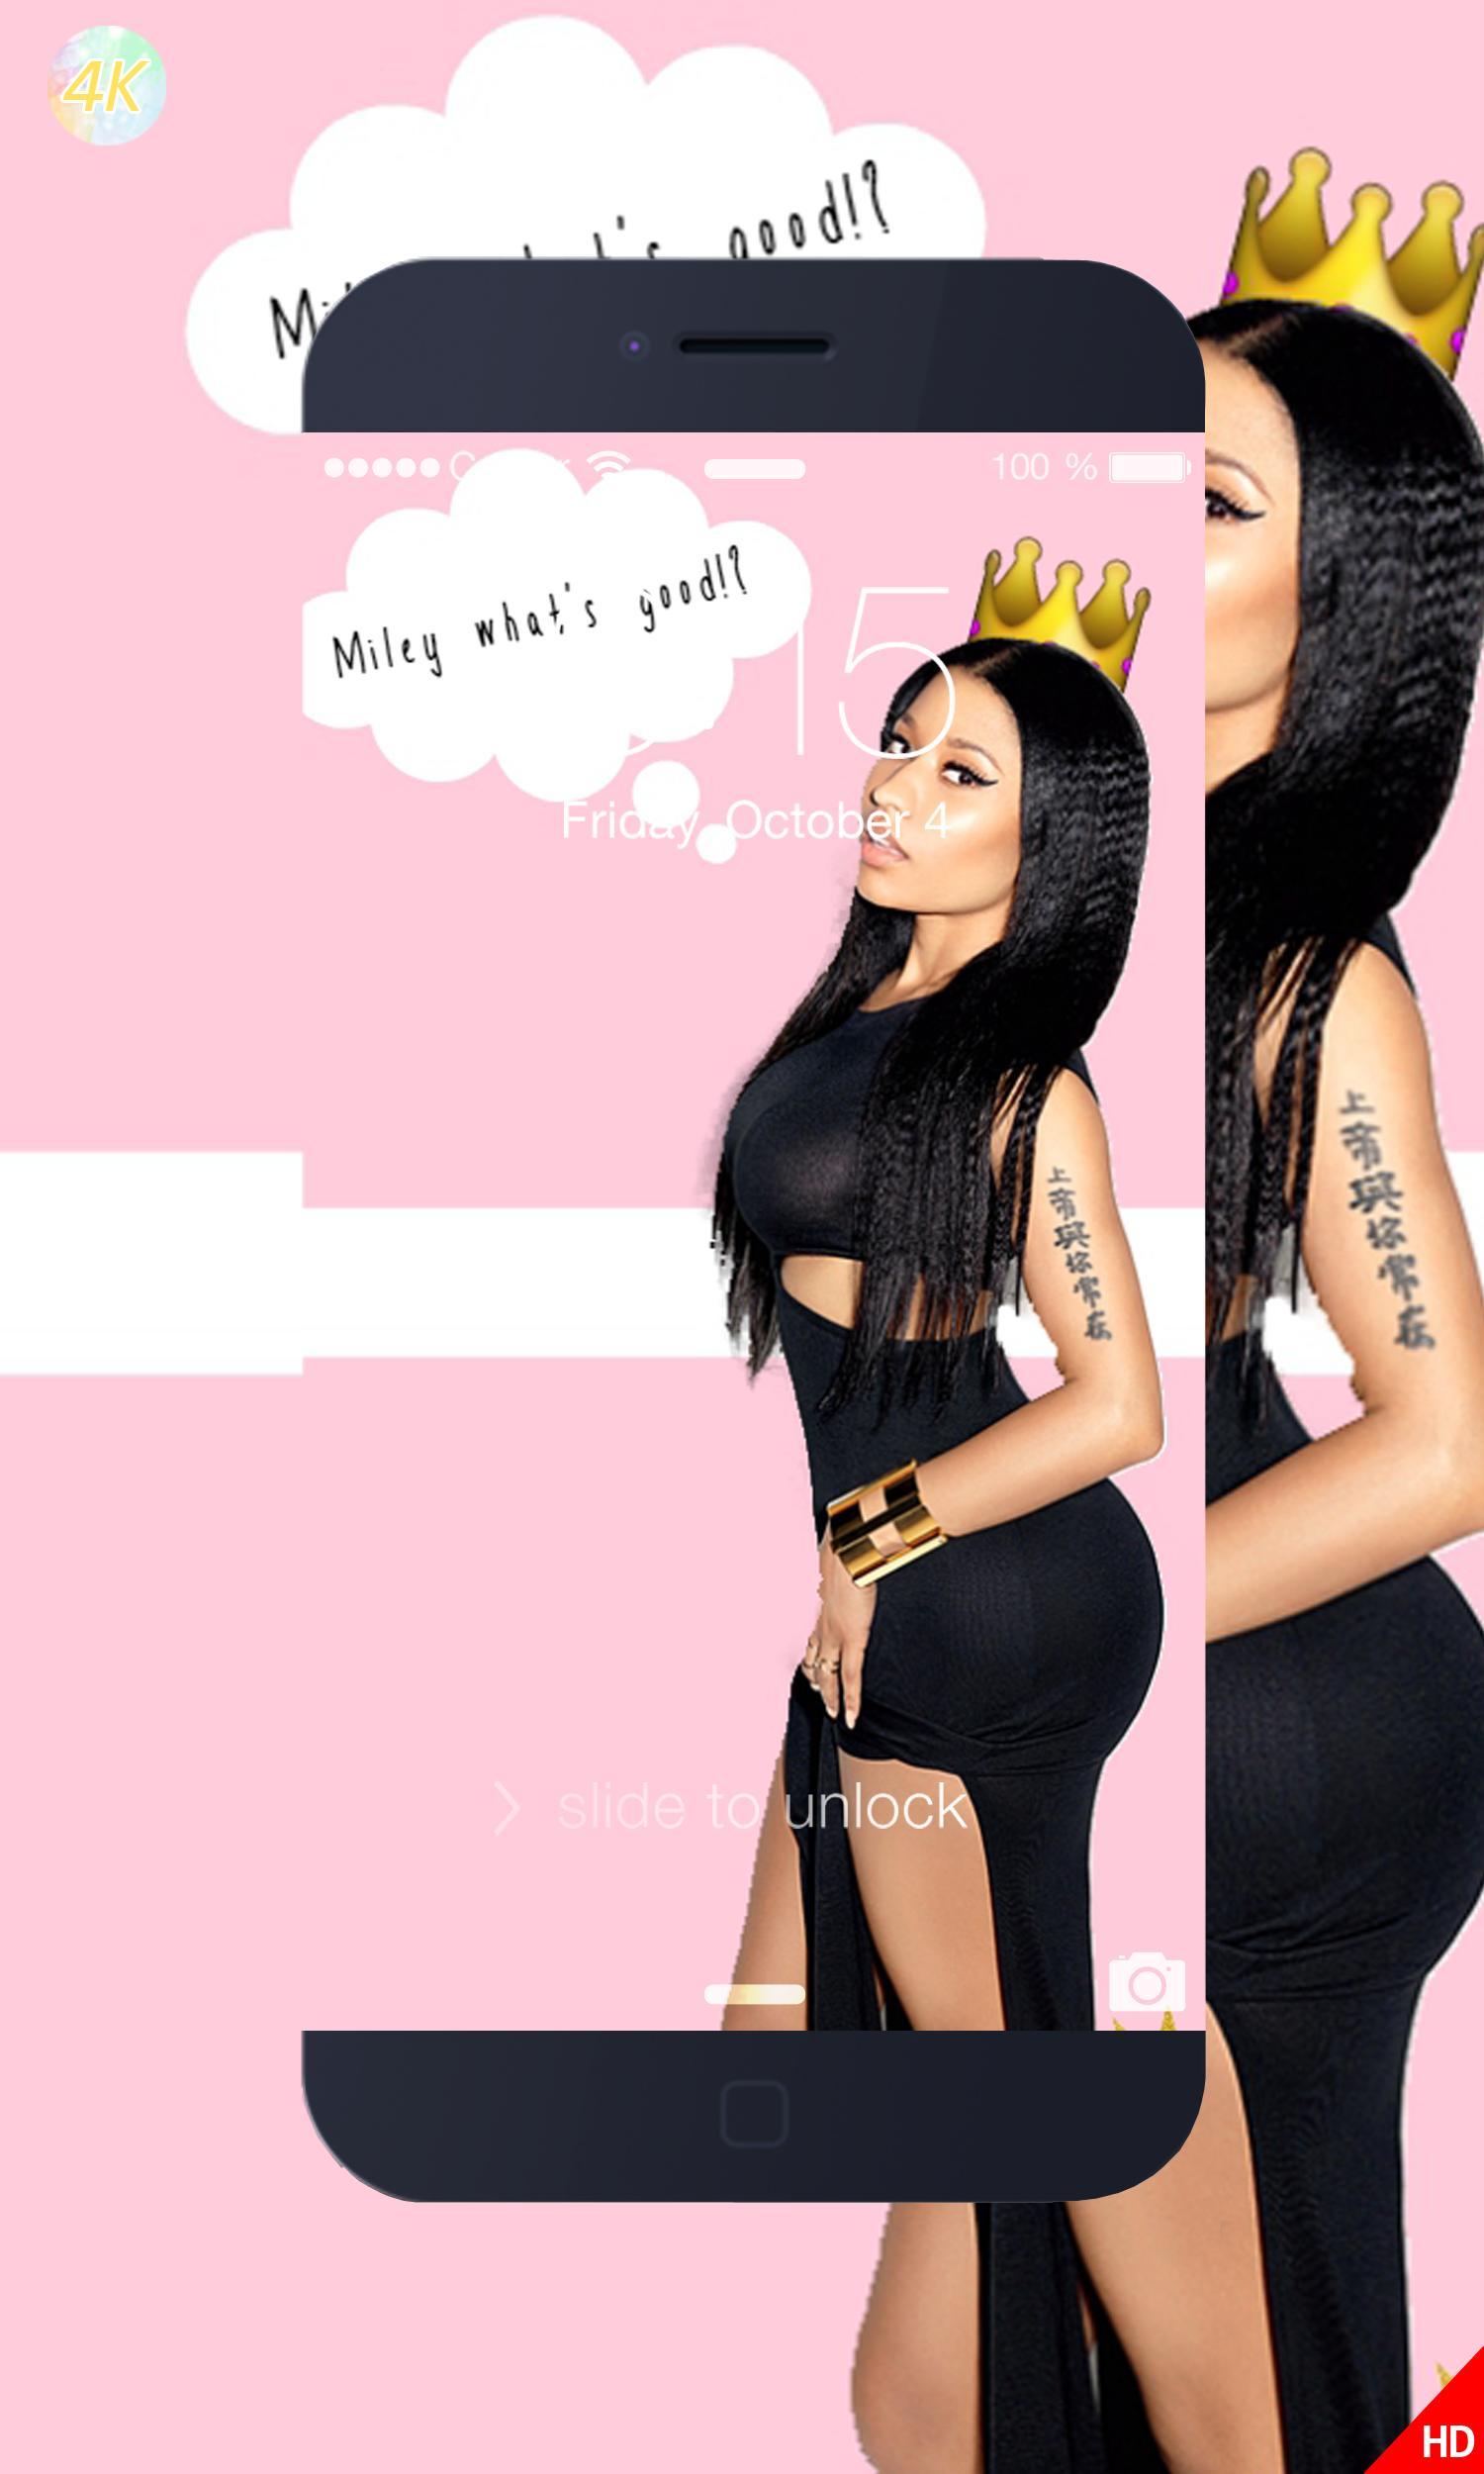 Nicki Minaj Wallpapers For Android Apk Download